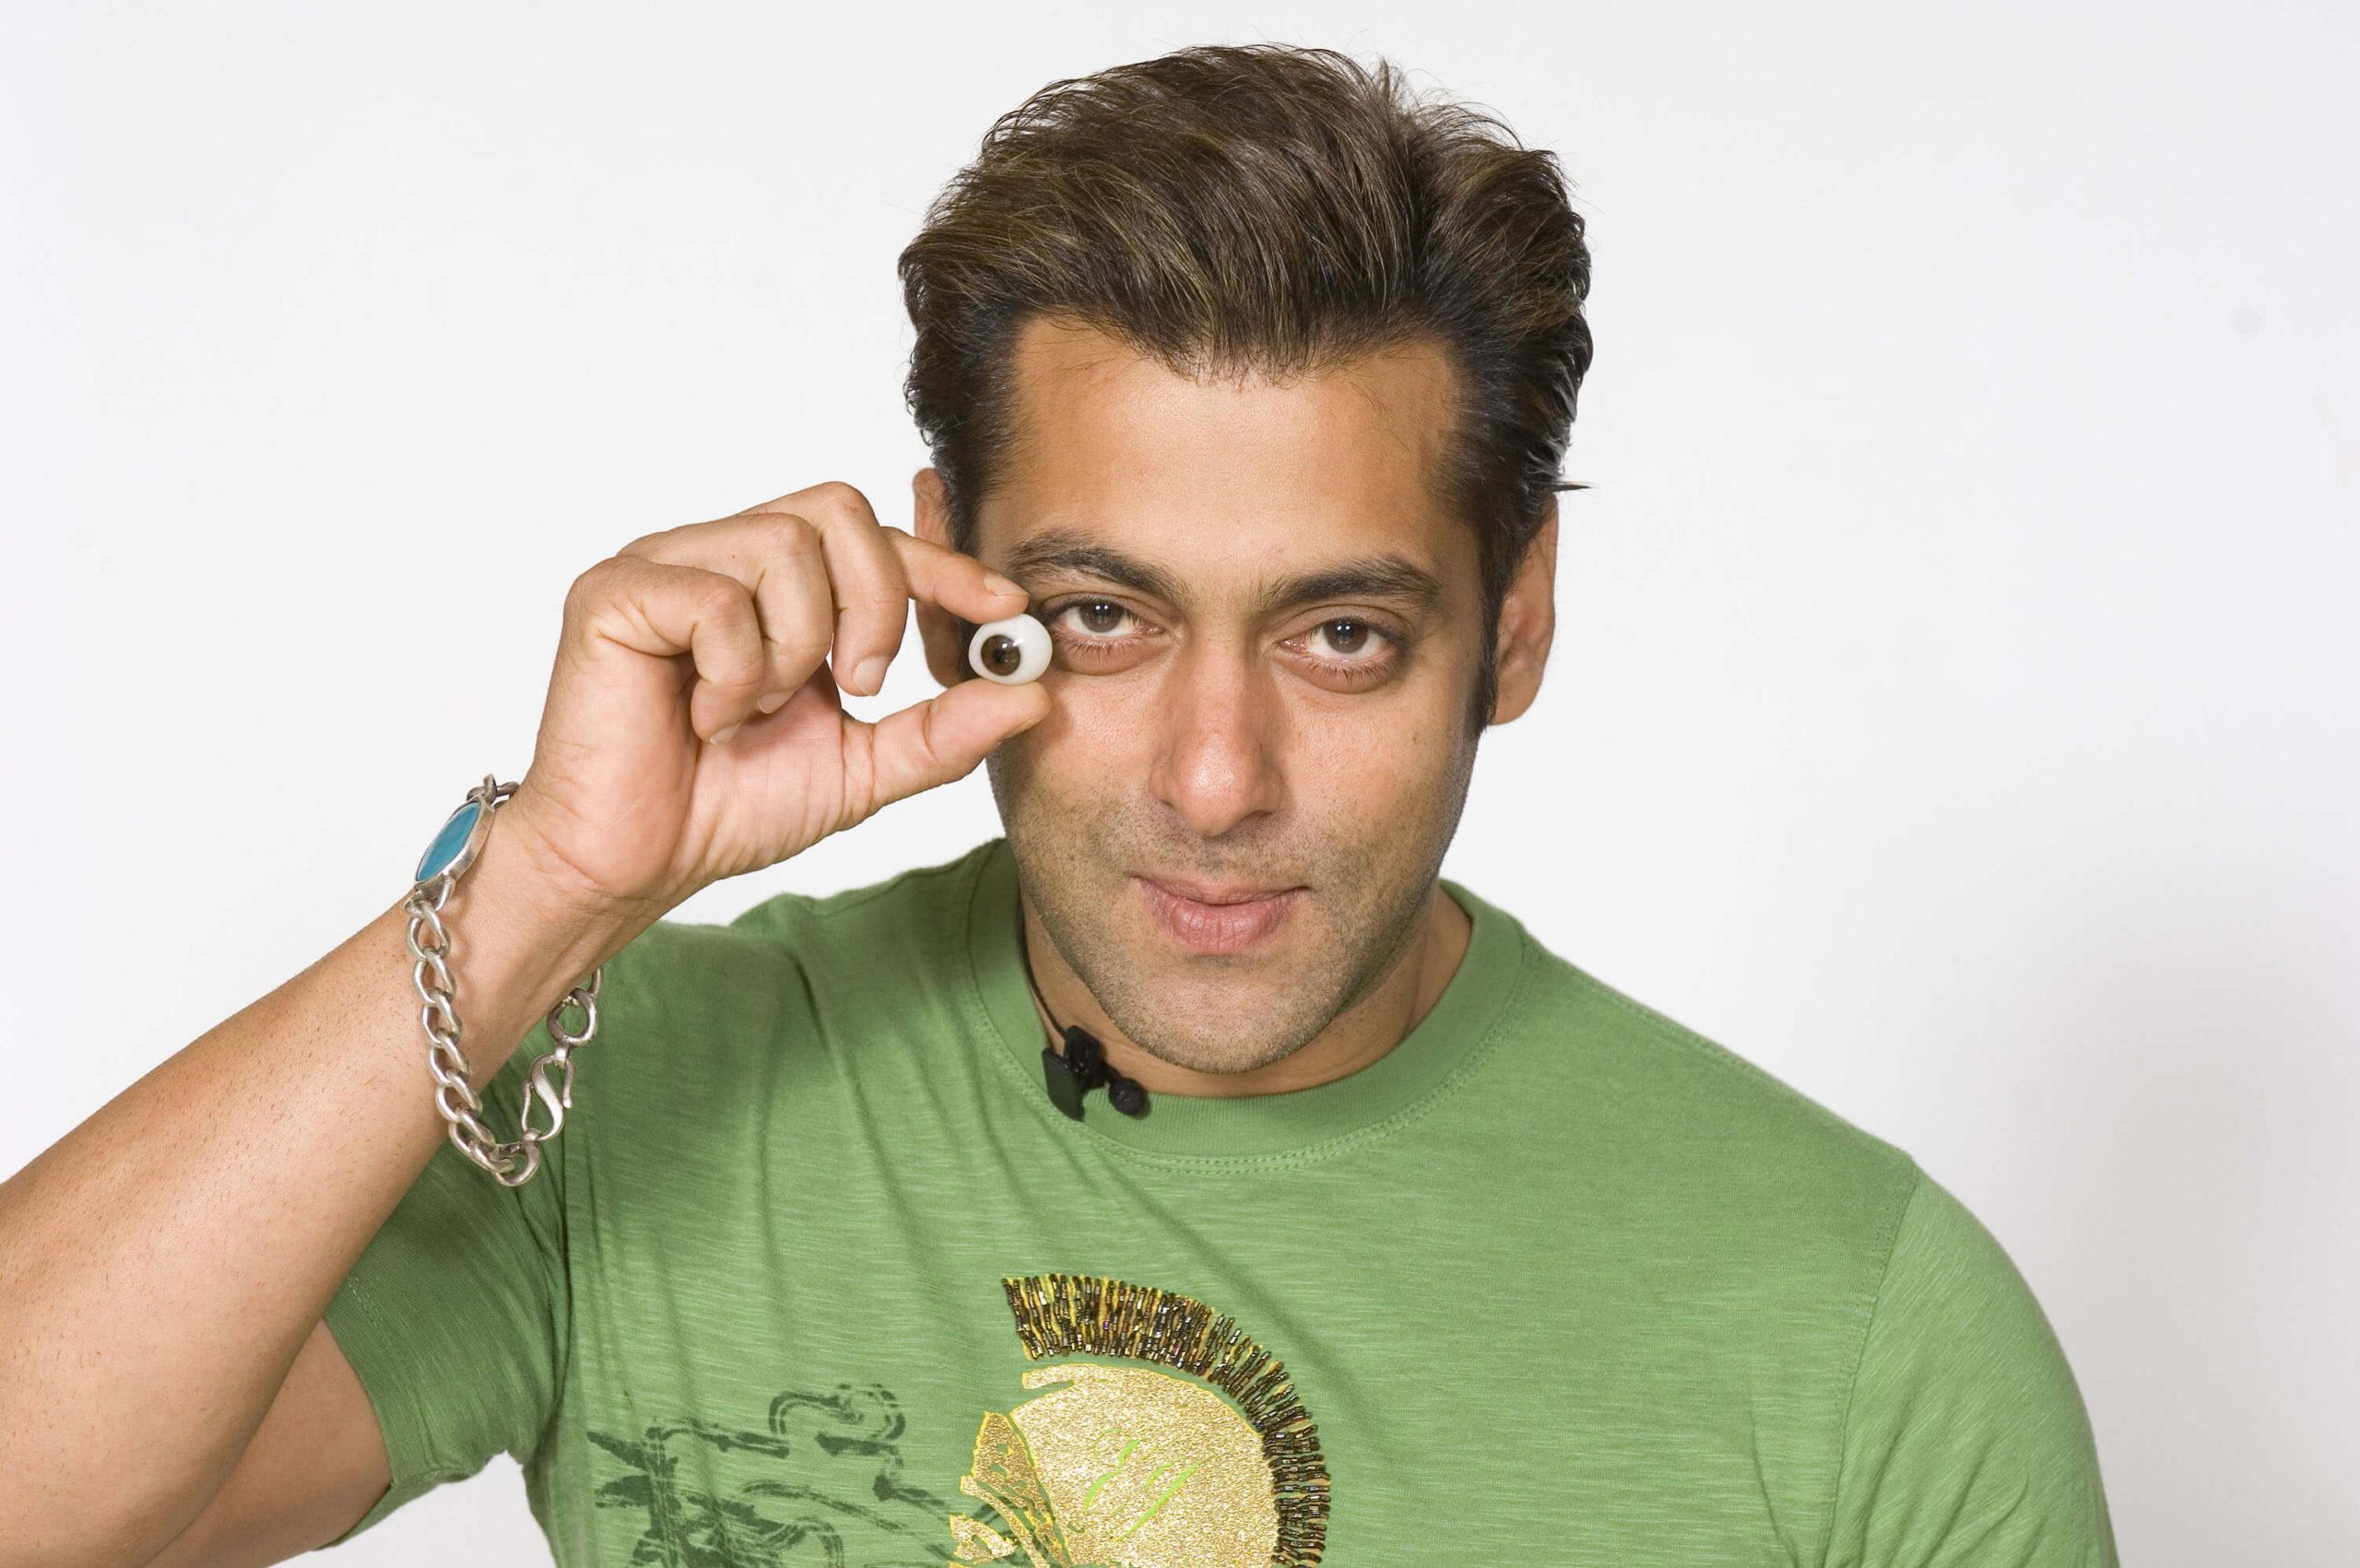 Salman Khan Photo, Age, News, Birthday, Height, Sister, Biography, Girlfriend, Awards, Address, Song, Video, Net Worth, Education, Twitter, Instagram, Facebook, Wiki, Imdb, Website, Youtube (2)